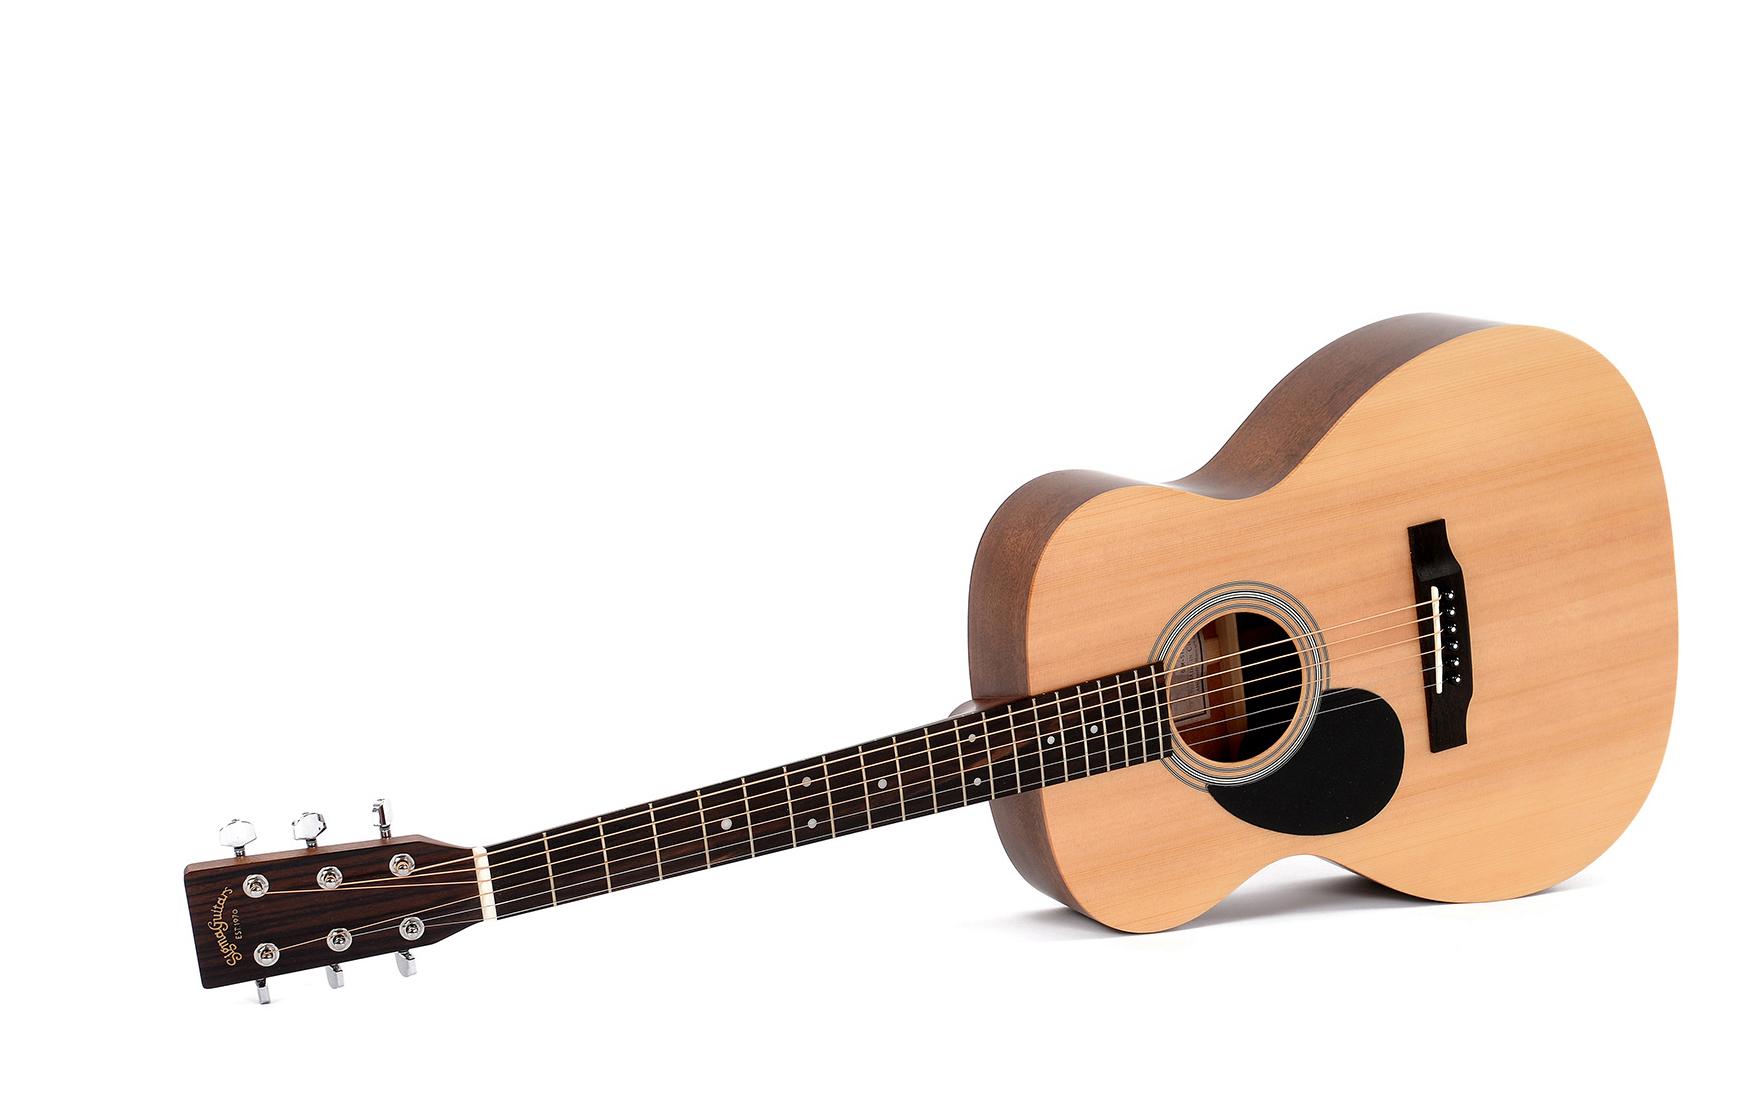 Omm Stl Sigma Guitars